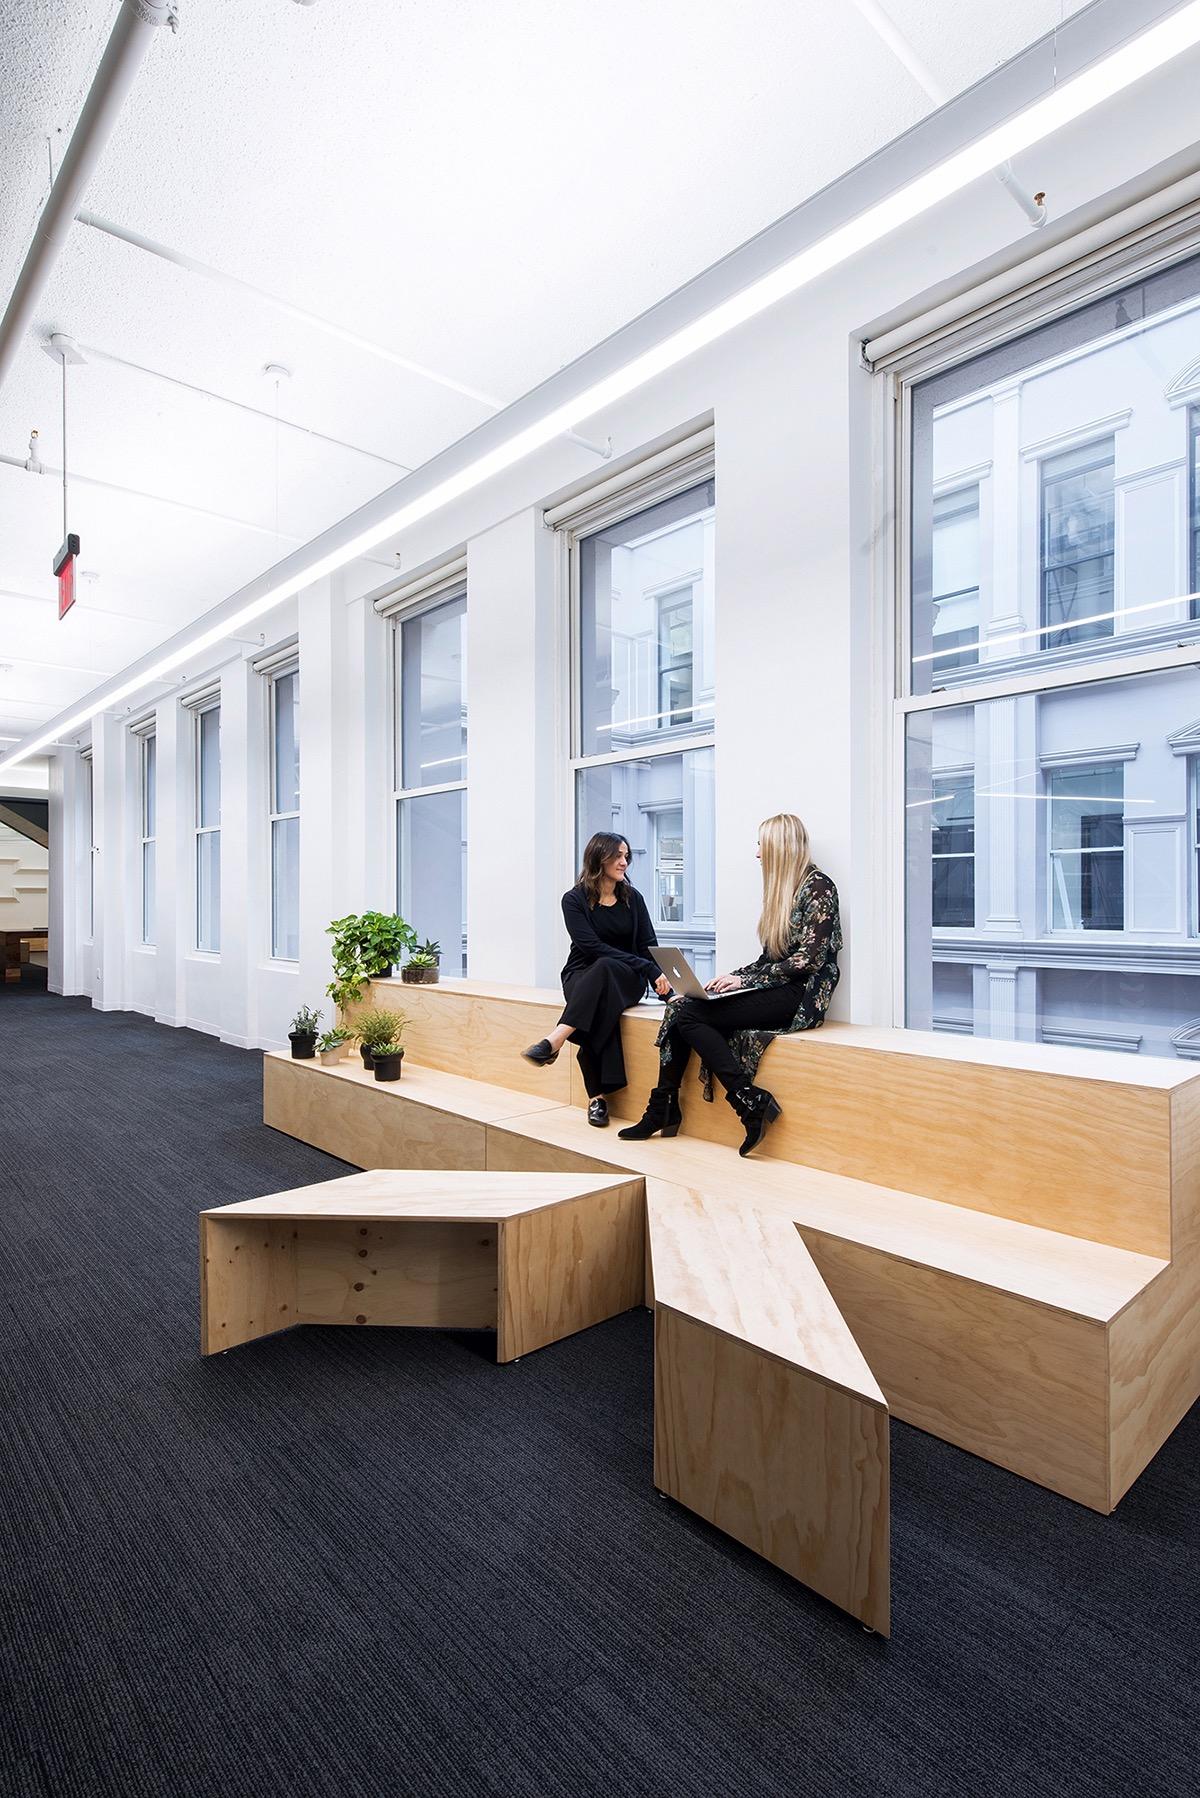 qz-office-nyc-11